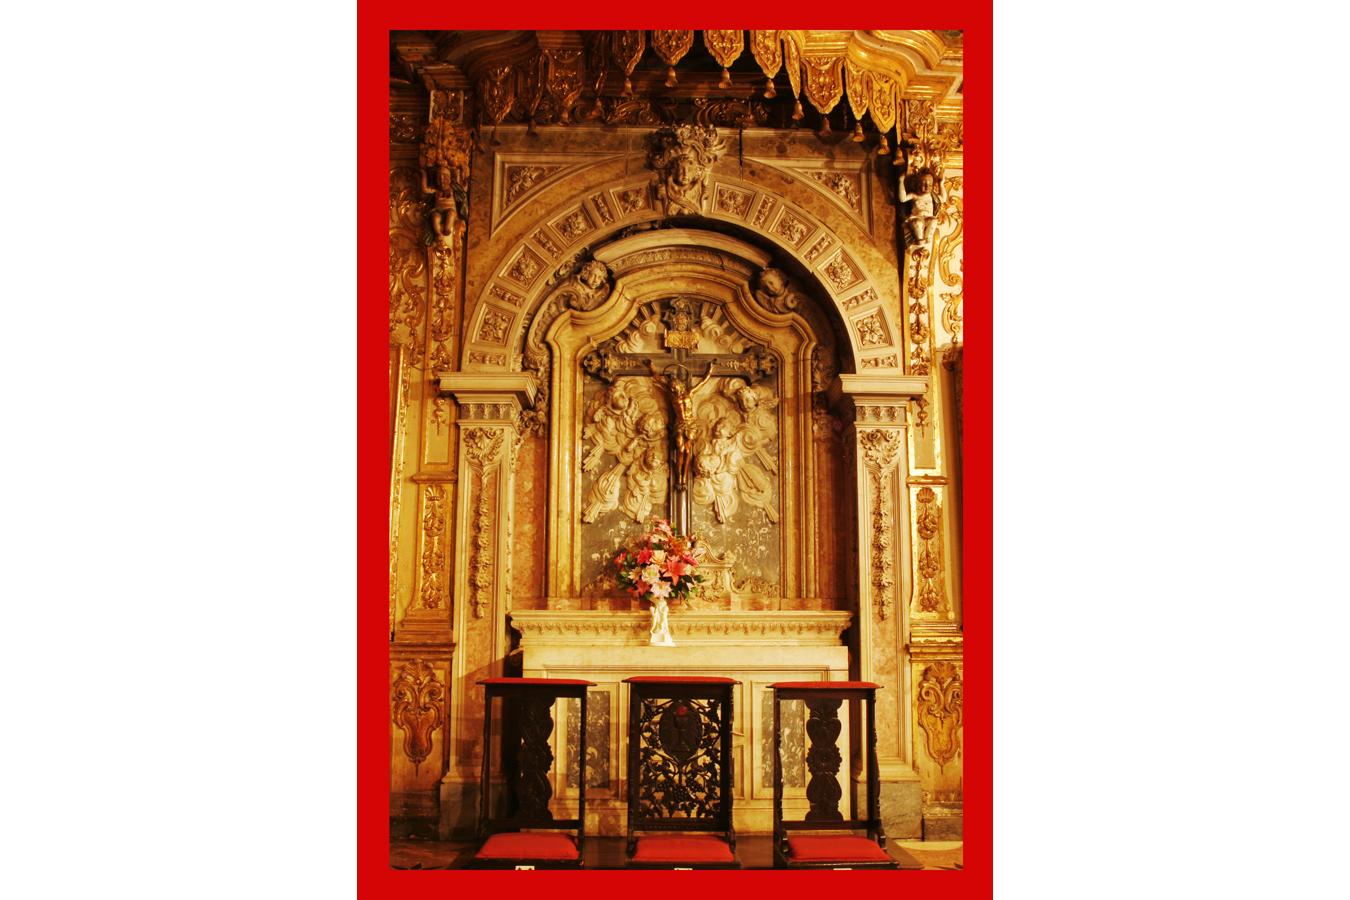 ConventoDoCarmoHotel_MG_8578Web.jpg